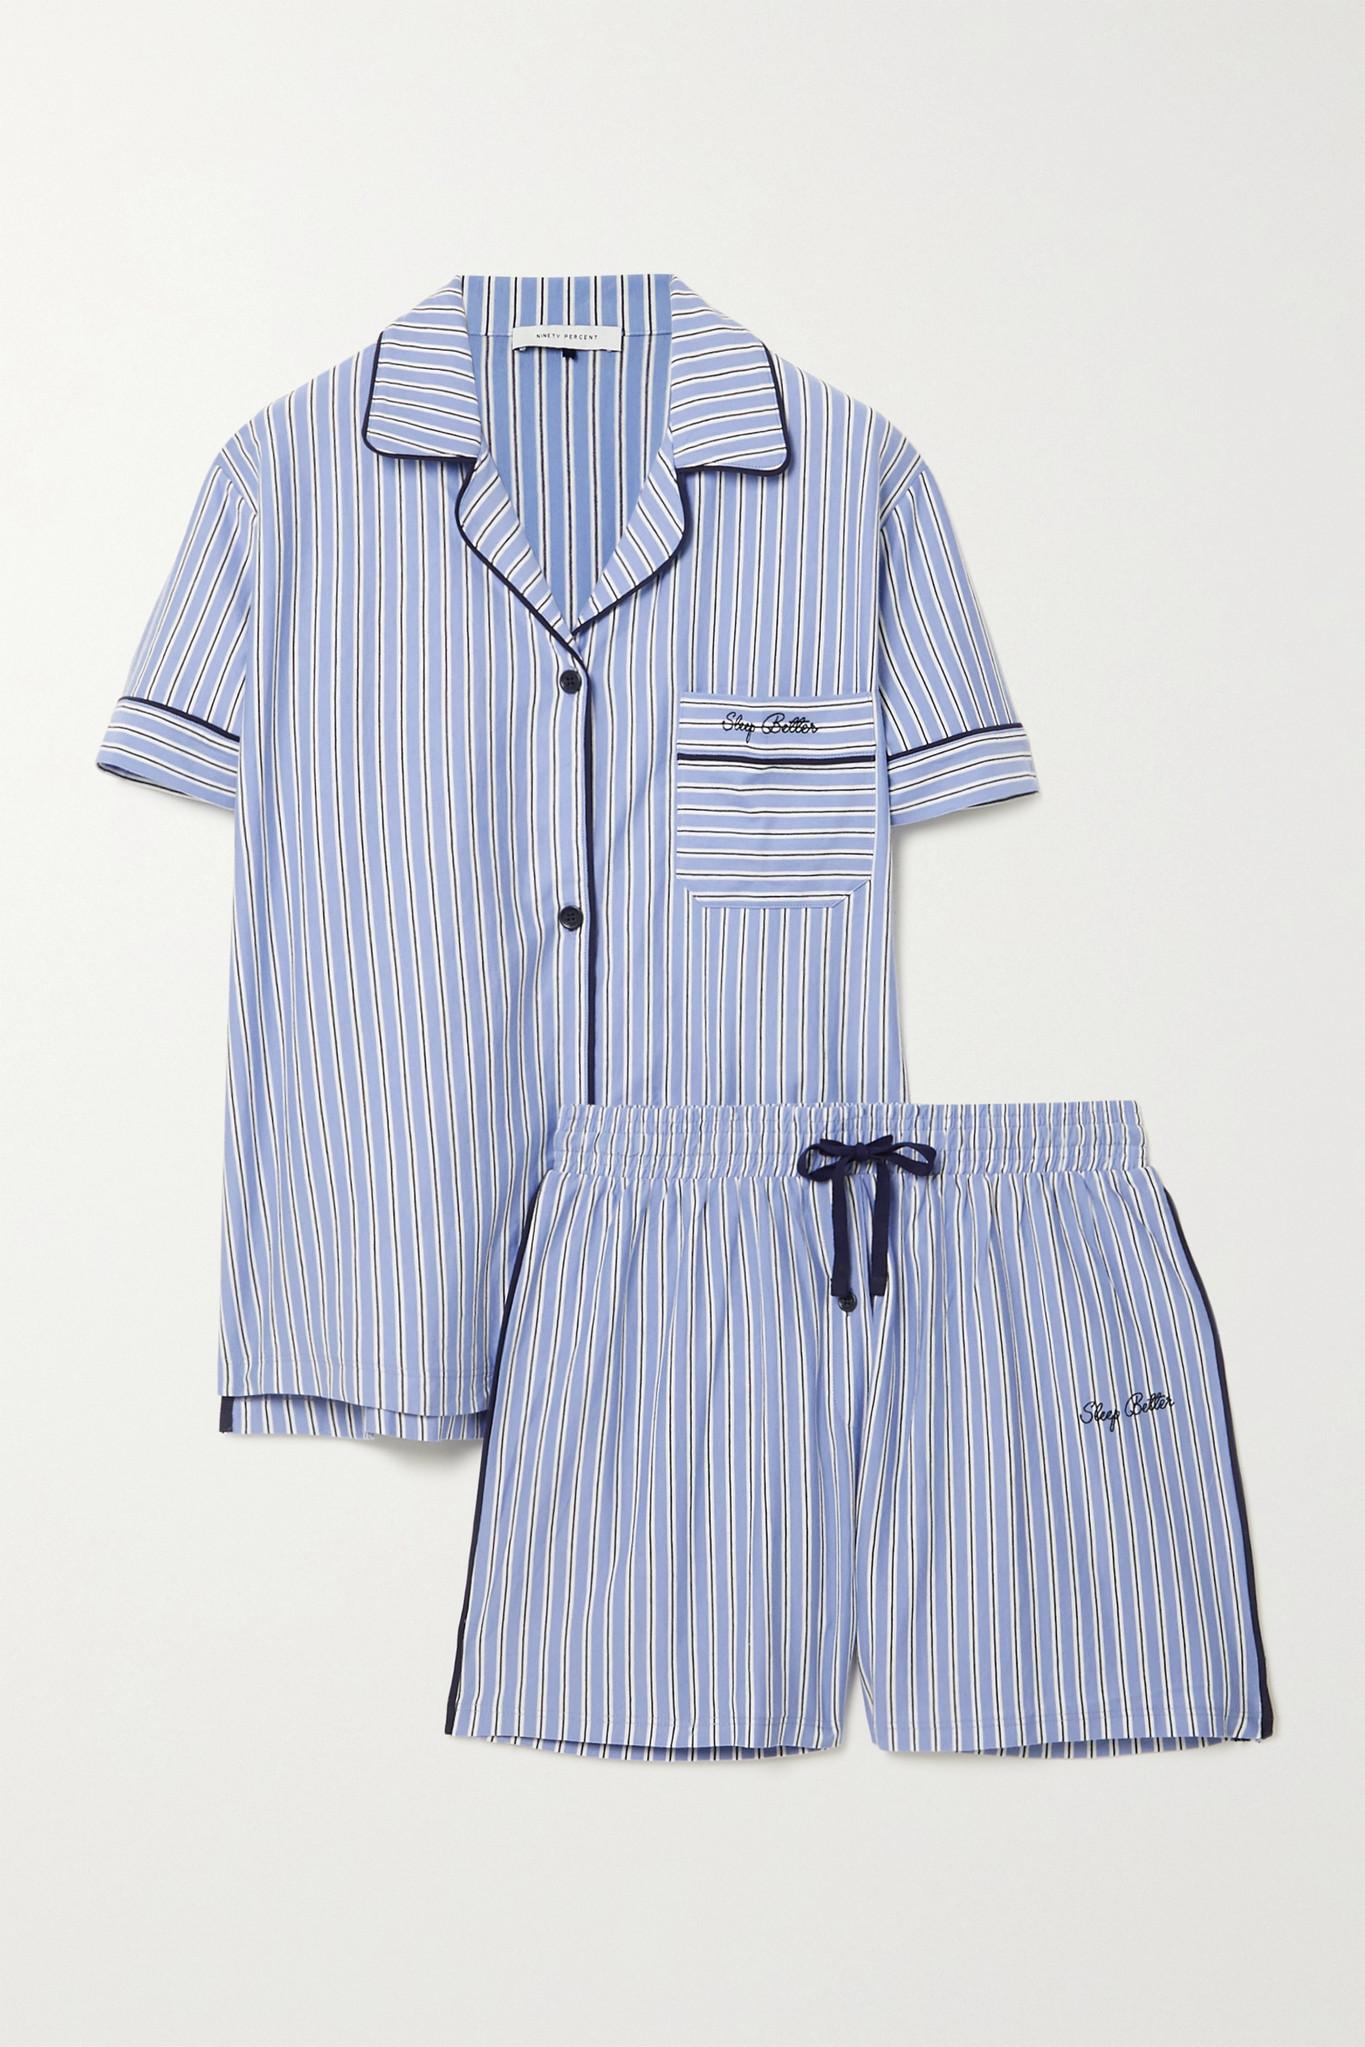 NINETY PERCENT - 【net Sustain】刺绣条纹有机纯棉平纹布睡衣套装 - 蓝色 - x small